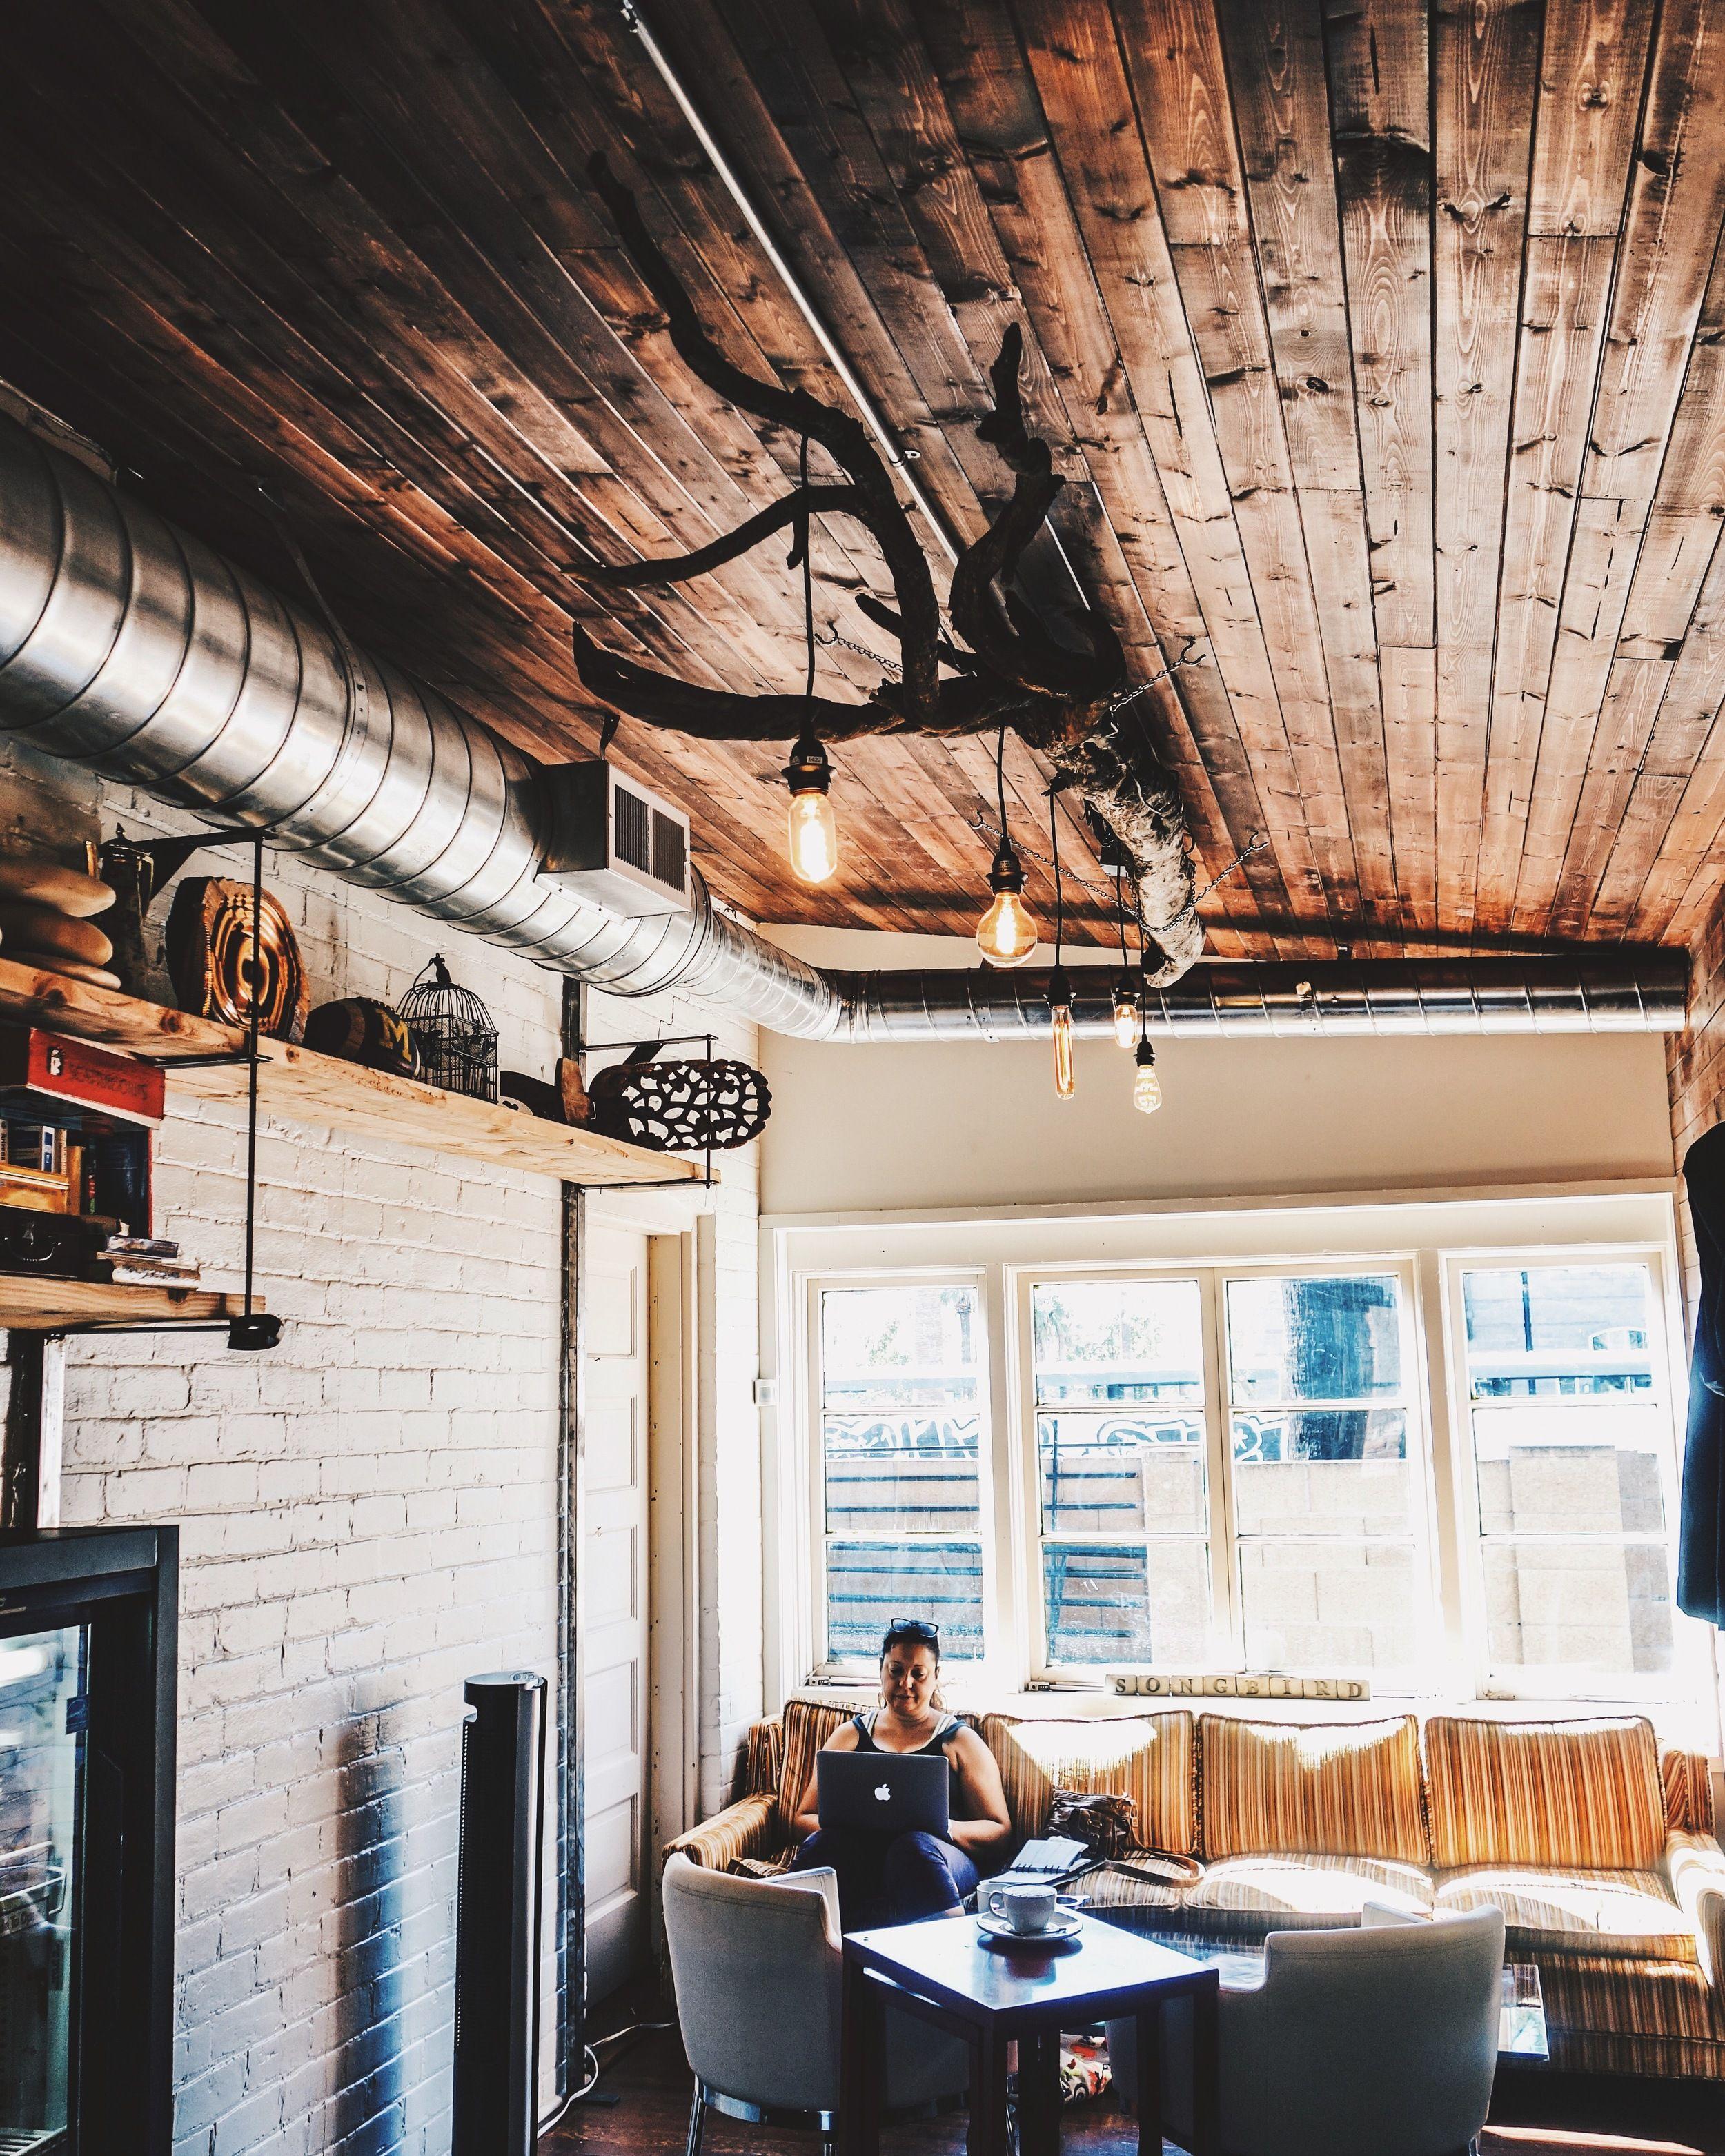 Songbird Coffee & Tea - Phoenix, A.Z. — The Coffee Nomad